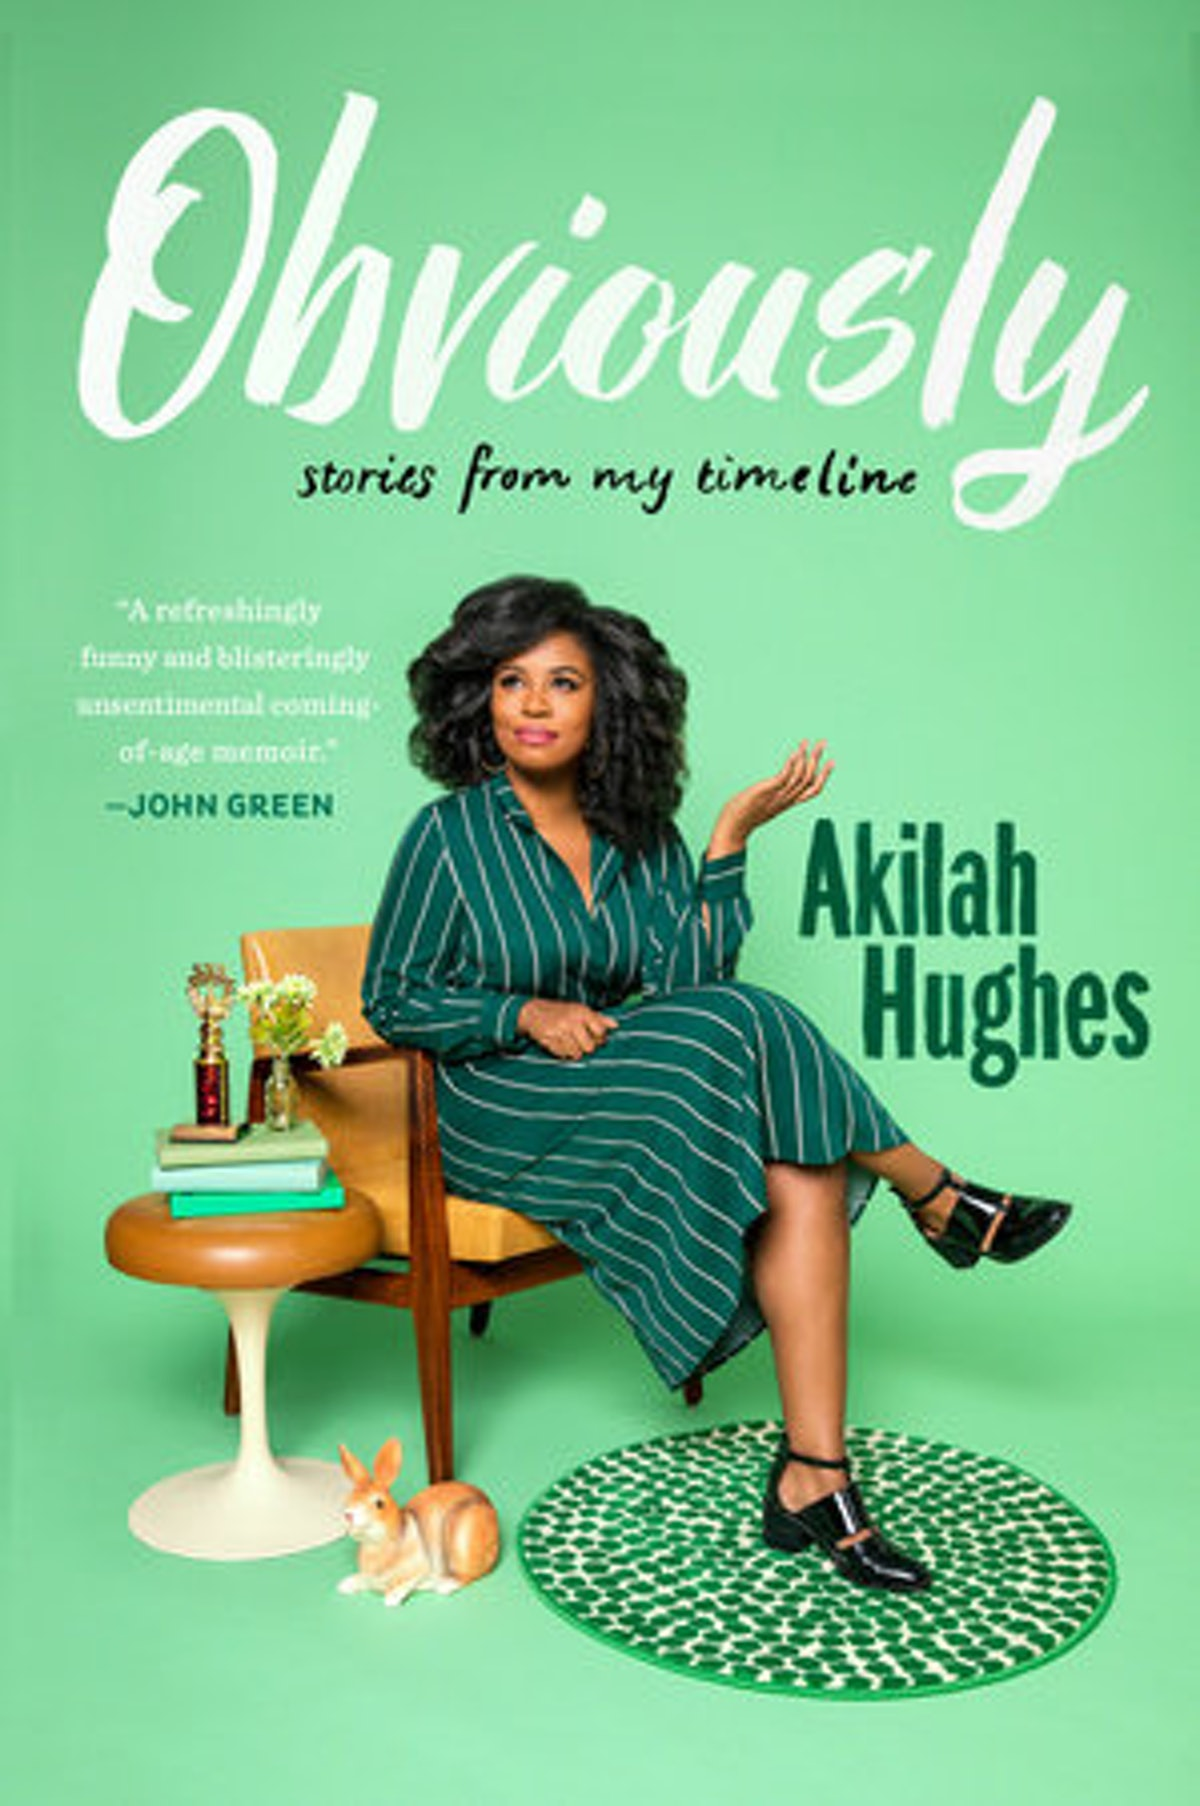 'Obviously' by Akilah Hughes